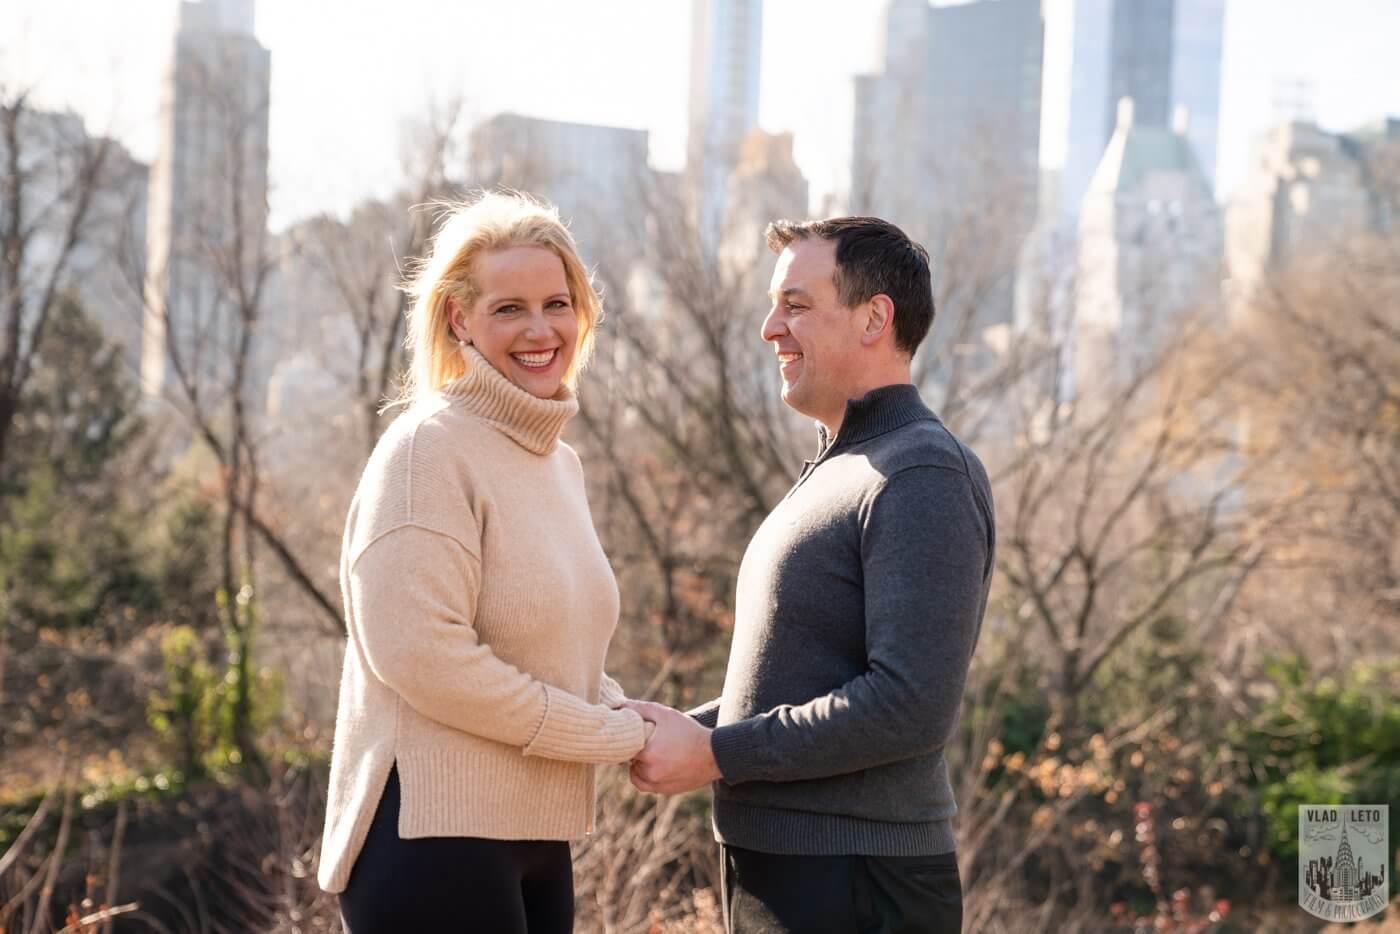 Photo 9 Central Park Wedding proposal | VladLeto